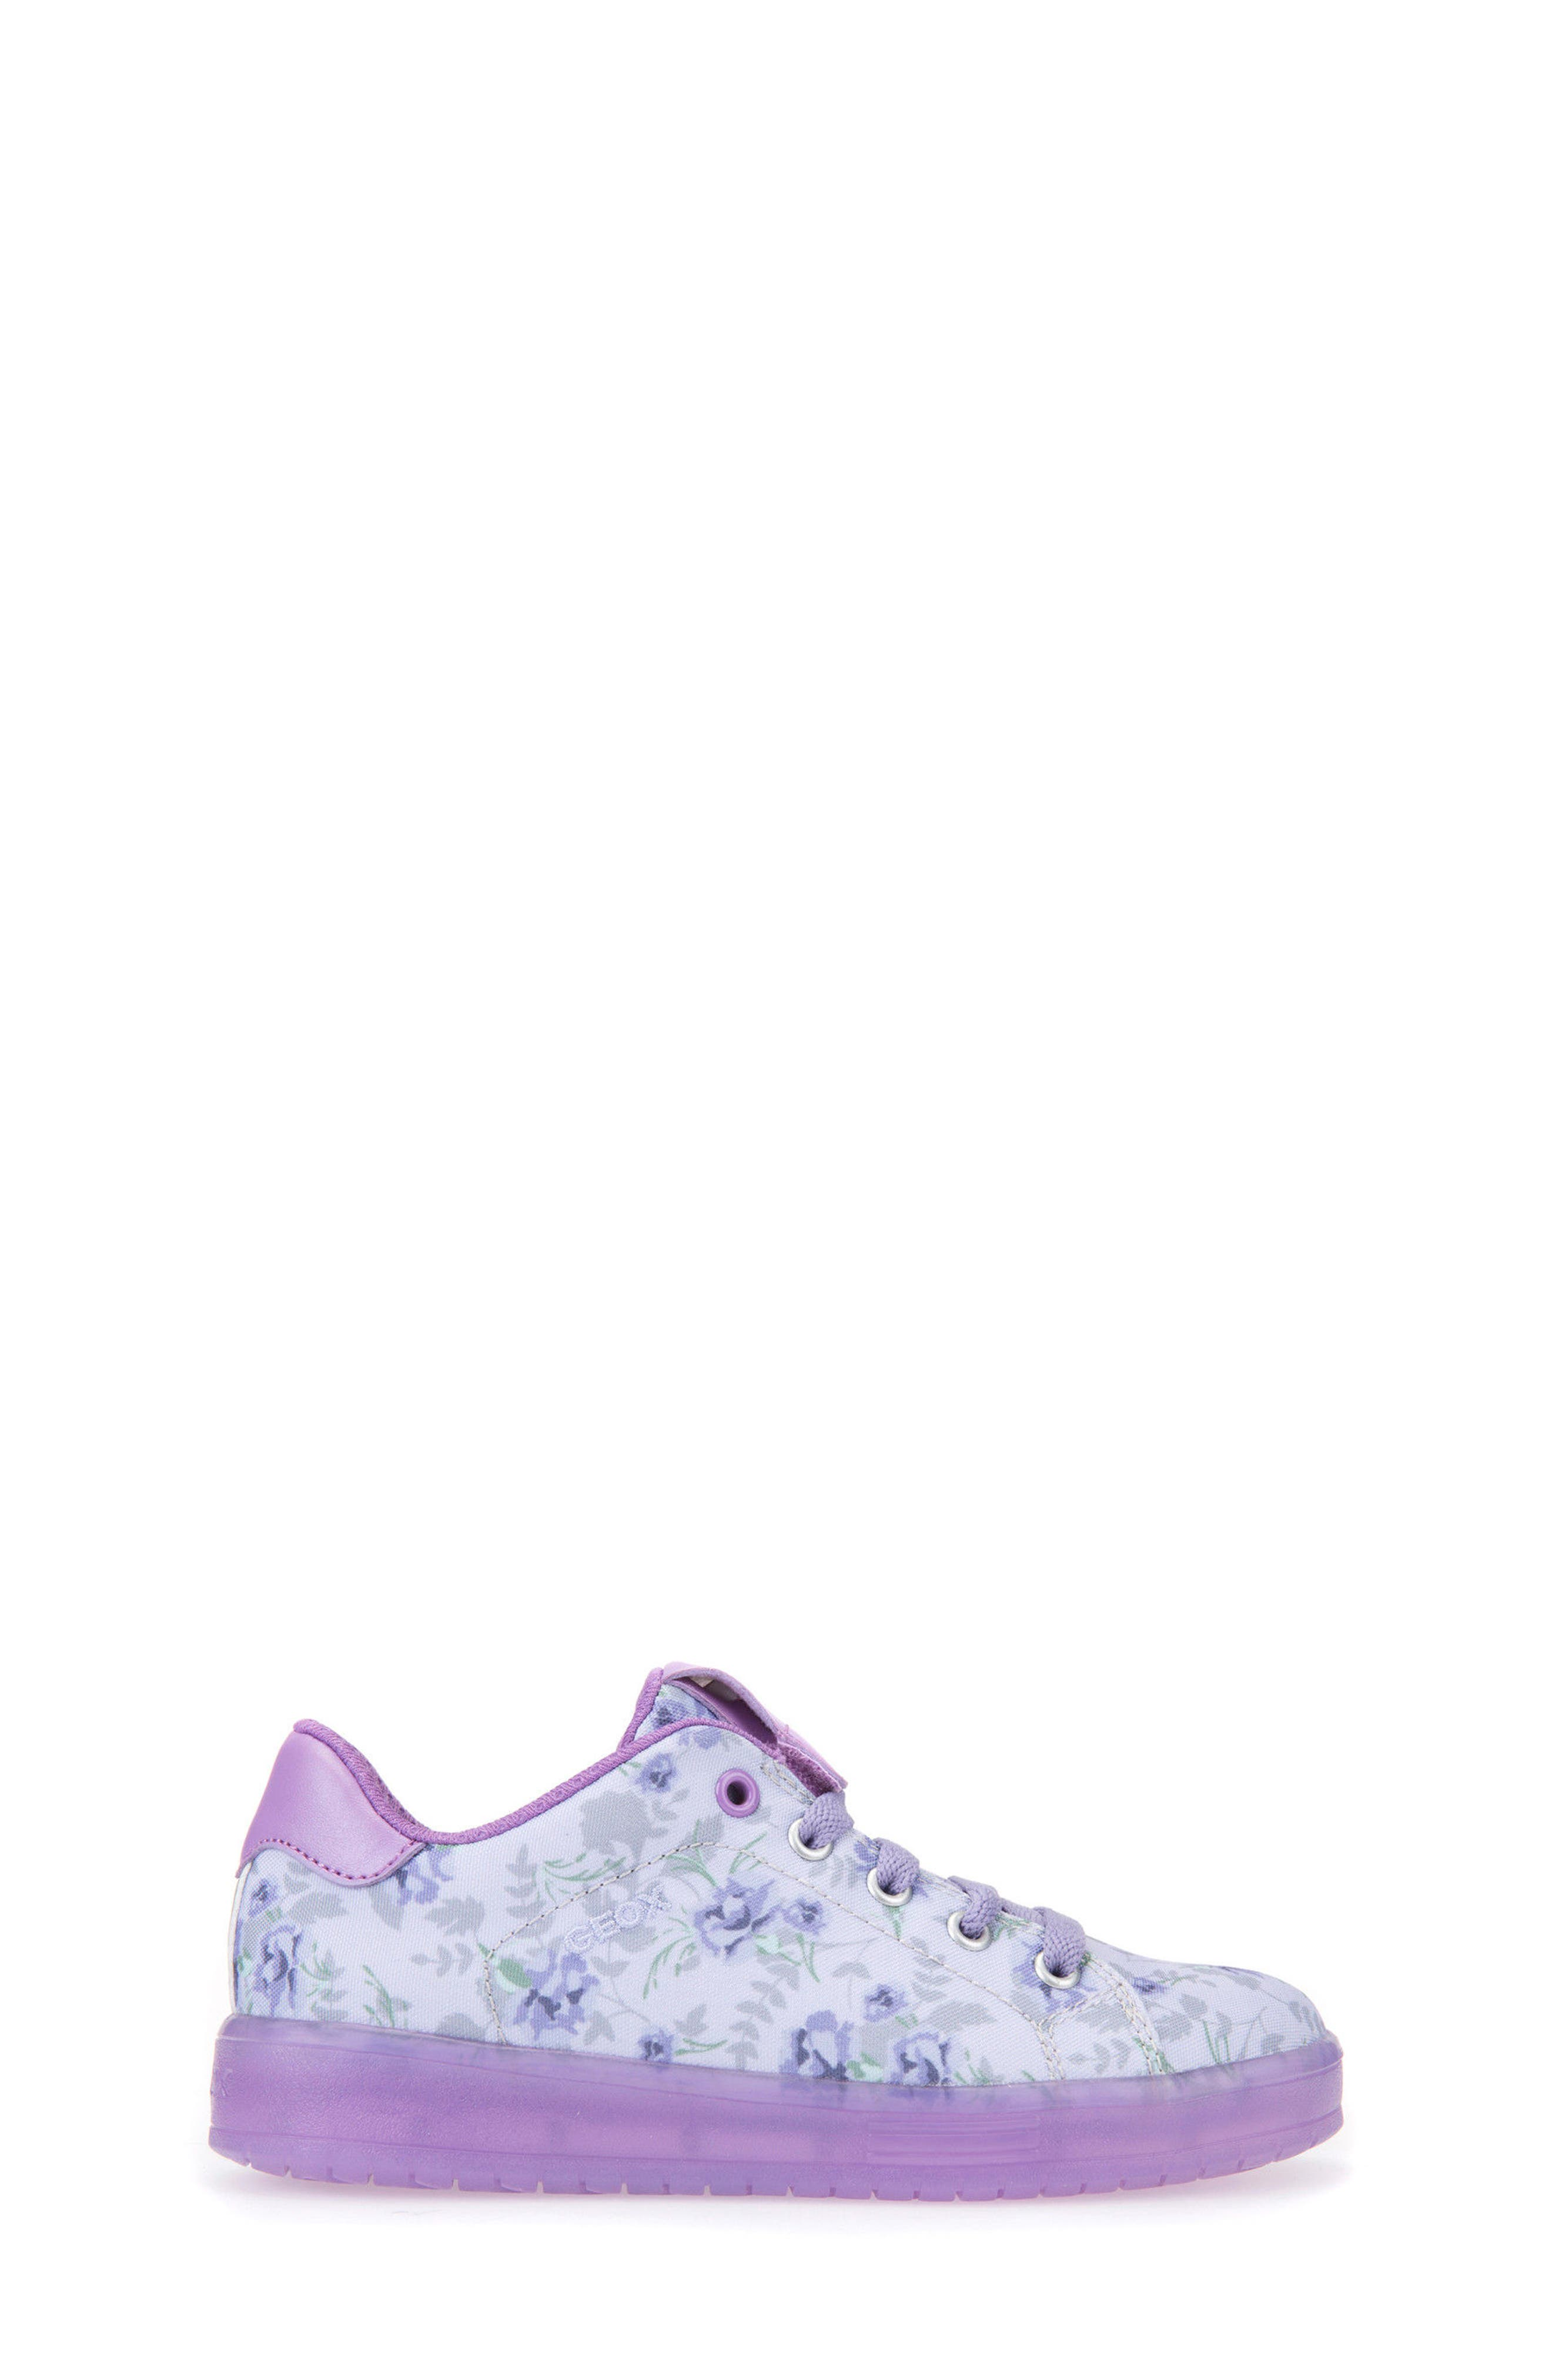 Alternate Image 3  - Geox Kommodor Light-Up Sneaker (Toddler, Little Kid & Big Kid)